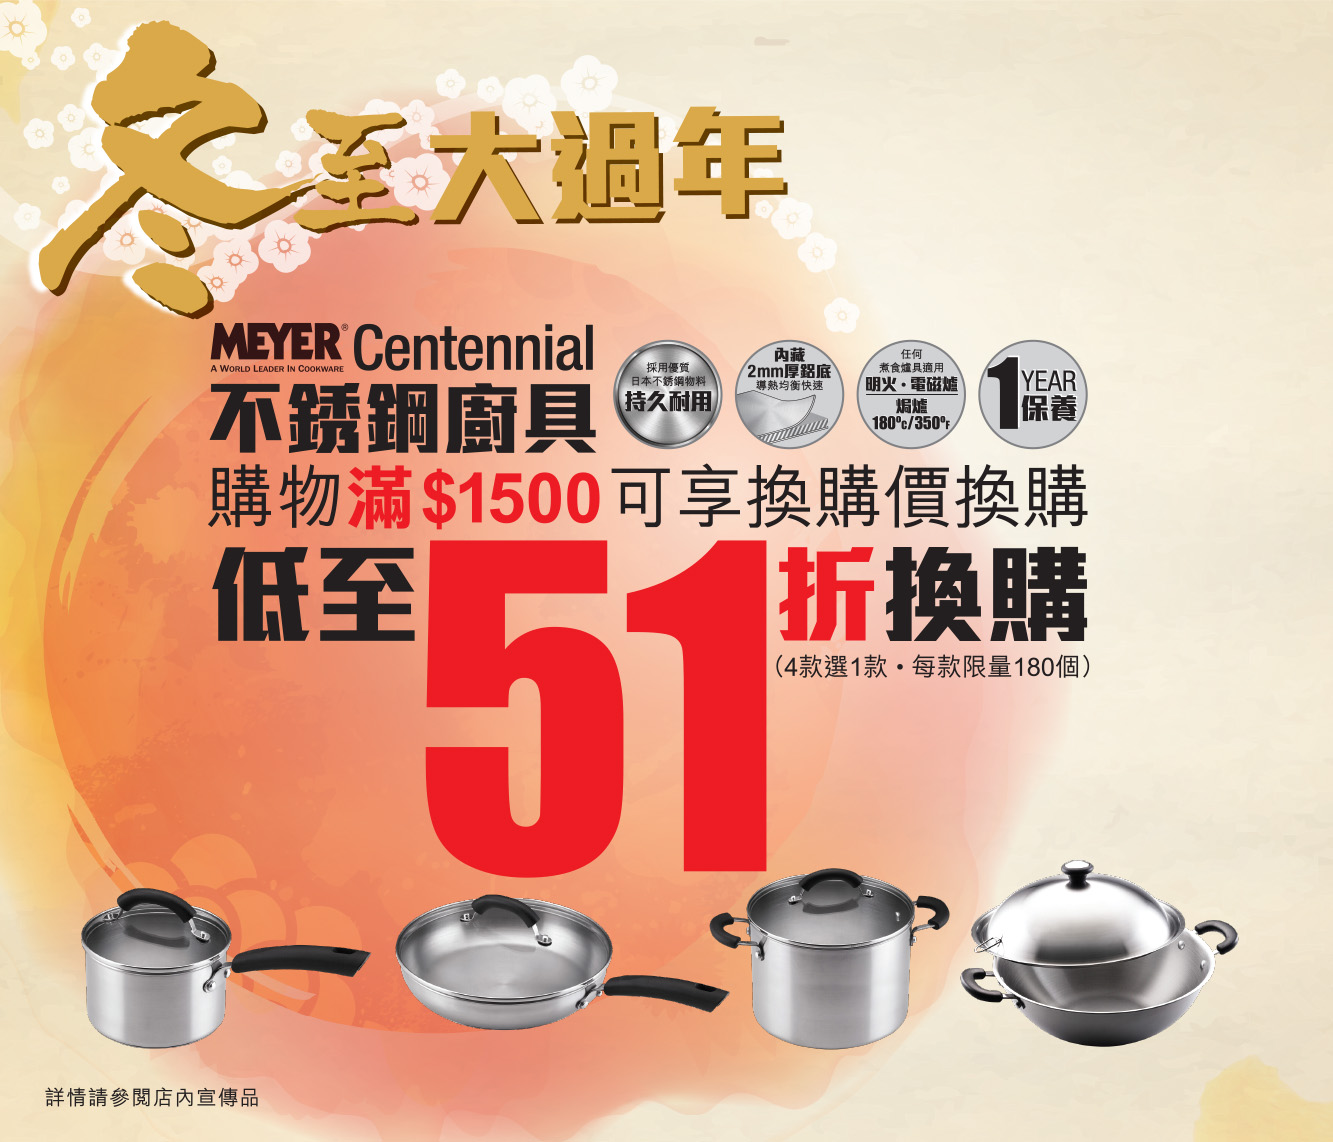 <!--:en-->Winter solstice Promo 2<!--:--><!--:cn-->冬至大过年2<!--:--><!--:hk-->冬至大過年2<!--:-->